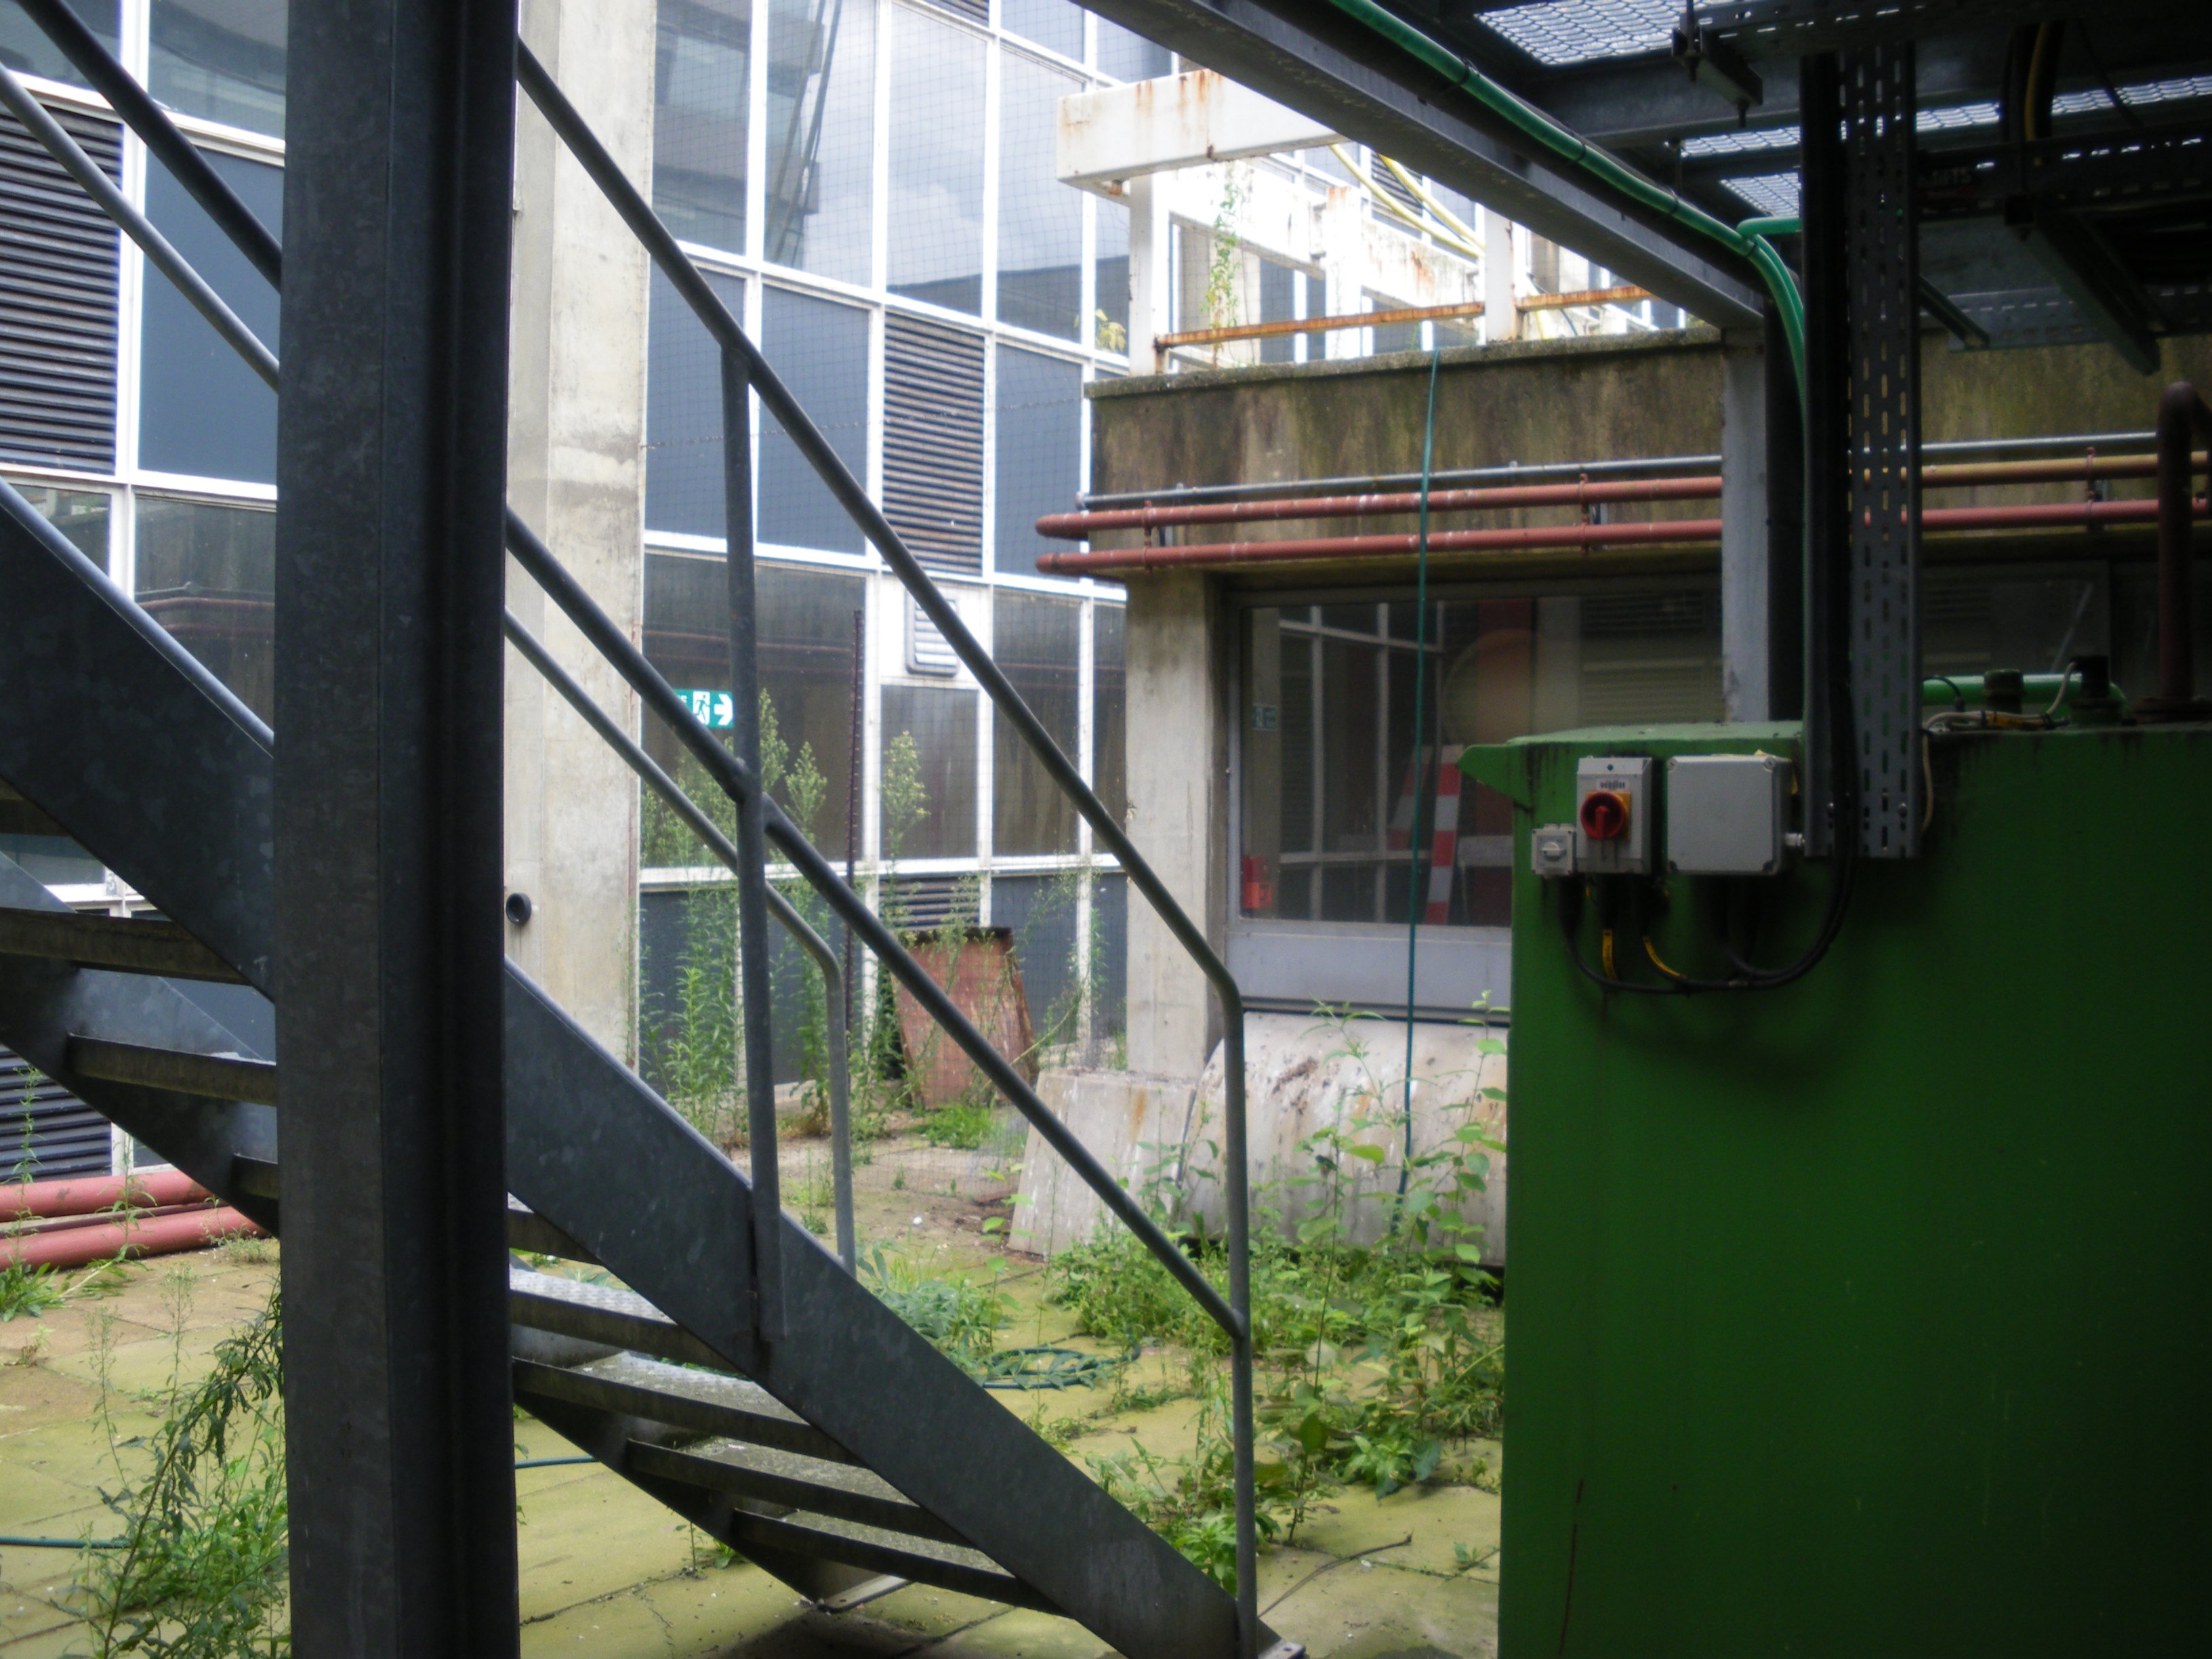 Underneath the CHP mezzanine platform